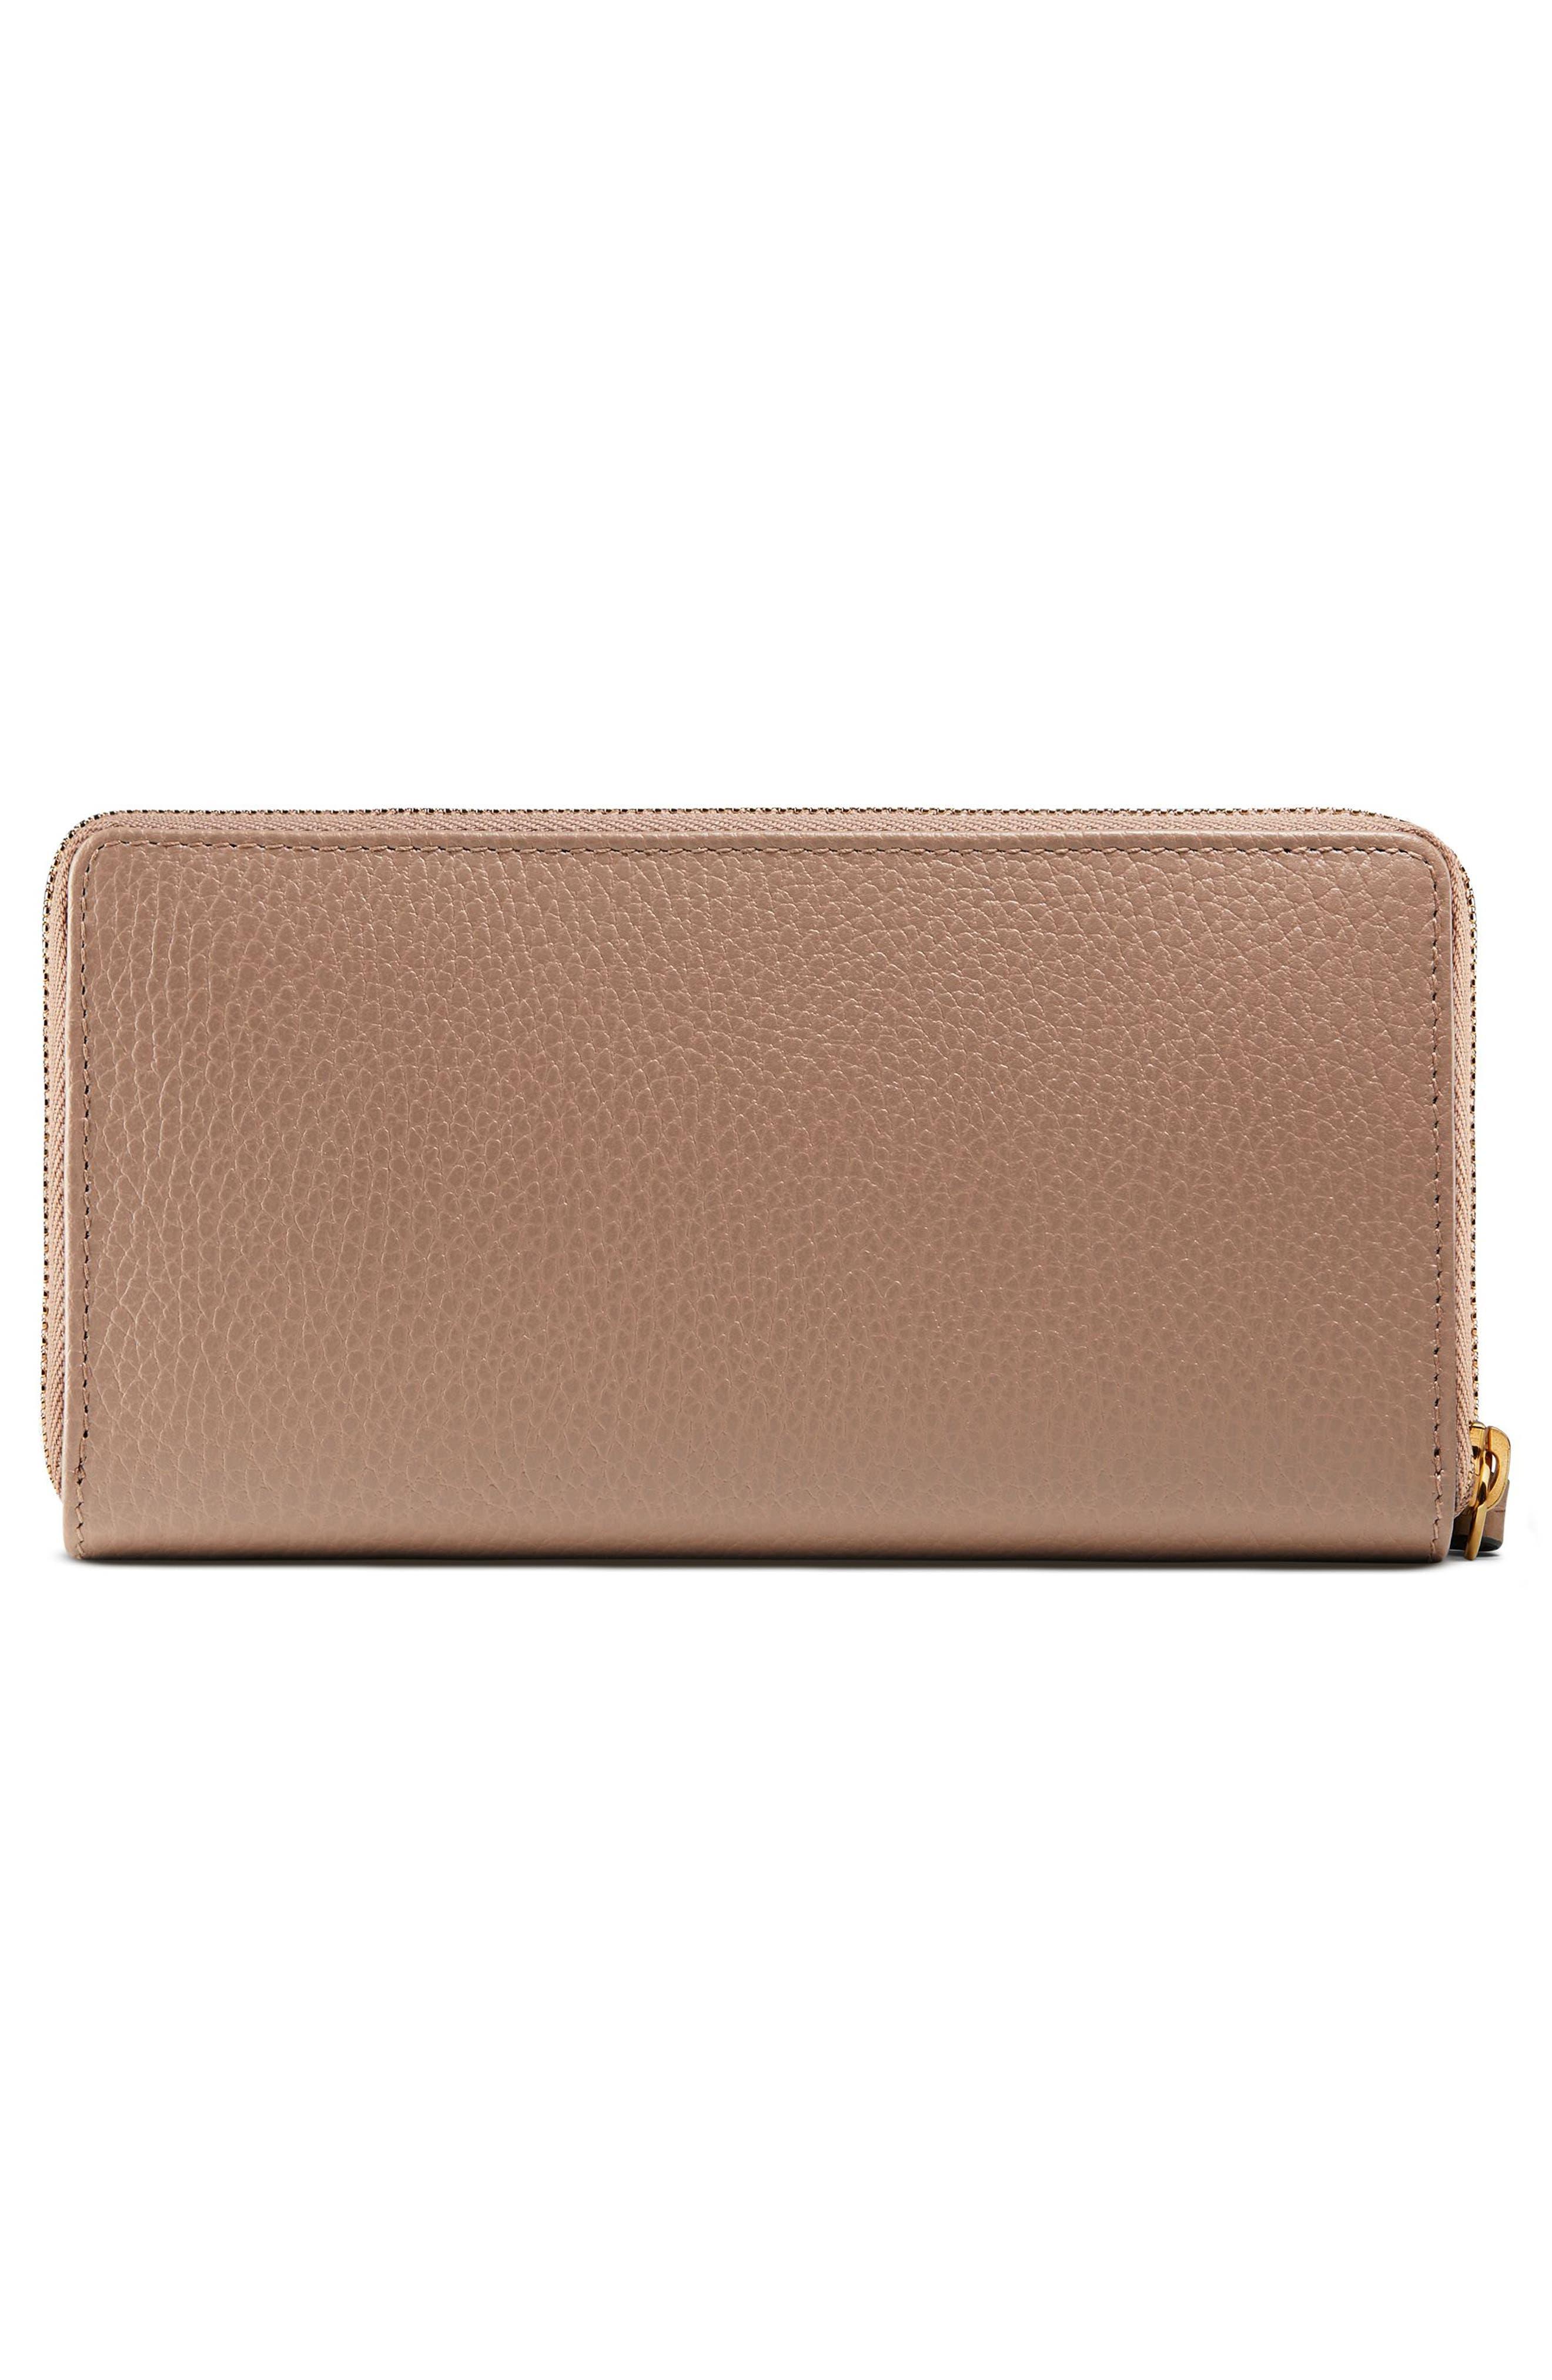 GUCCI, Petite Marmont Leather Zip Around Wallet, Alternate thumbnail 3, color, PORCELAIN ROSE